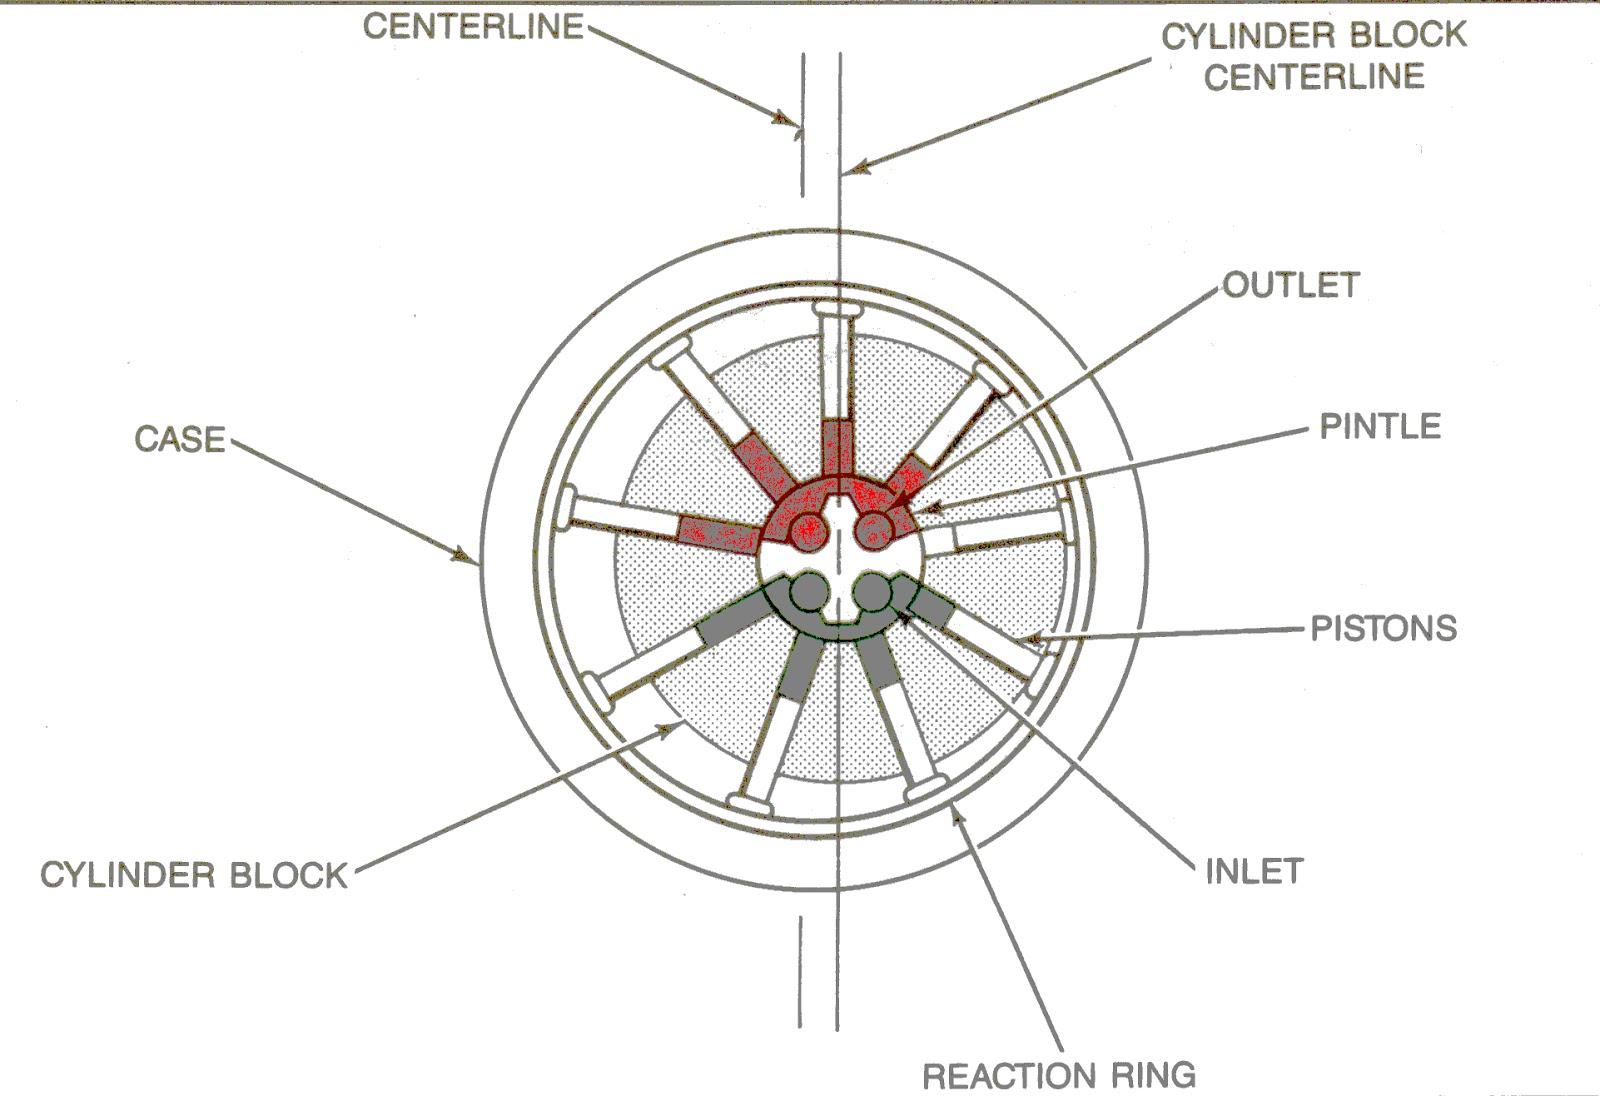 Diagram Technology Templates And Examples Part 3435 Gcv160 N7a1 Engine Jpn Honda Small Cylinder Parts Marineshelf Com Piston Pumps